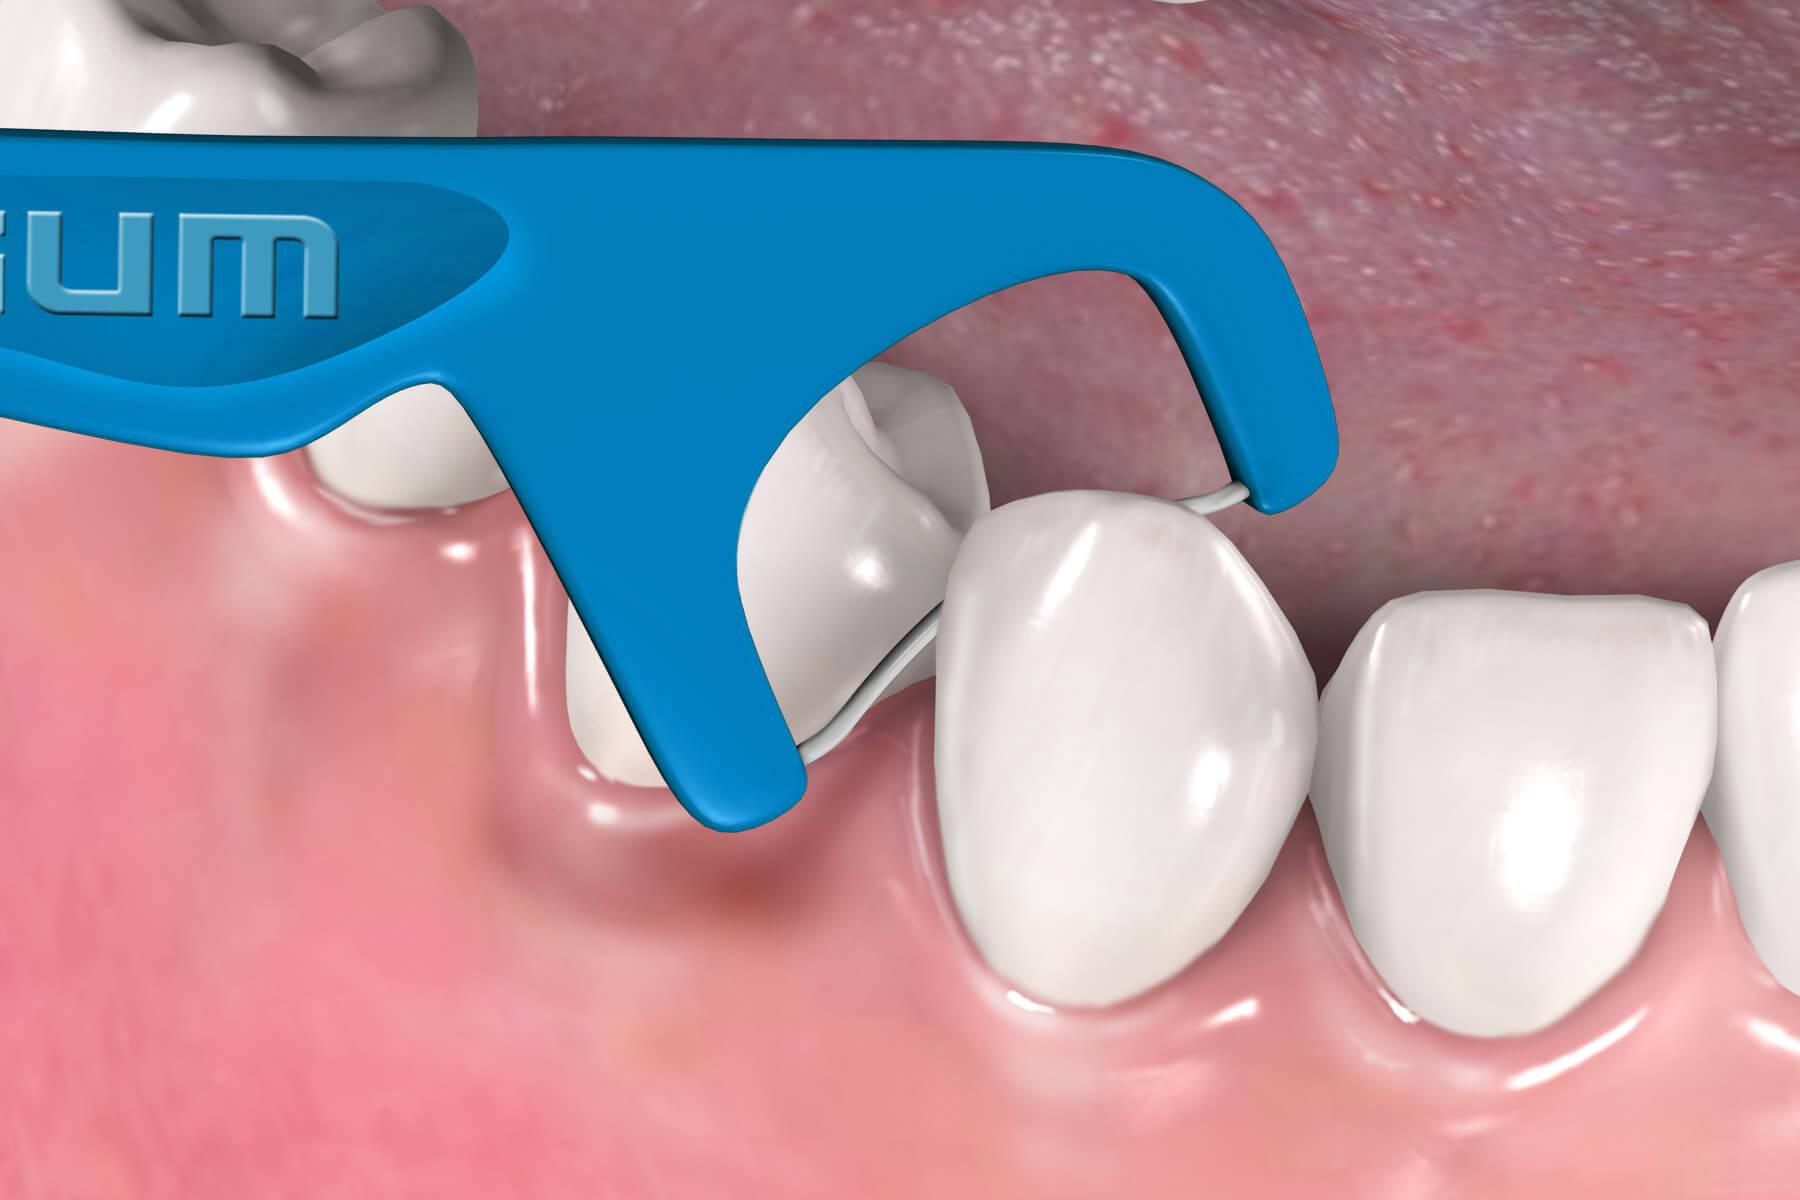 KIT GUM Higiene Oral Adulto: Sensitive + Flosser